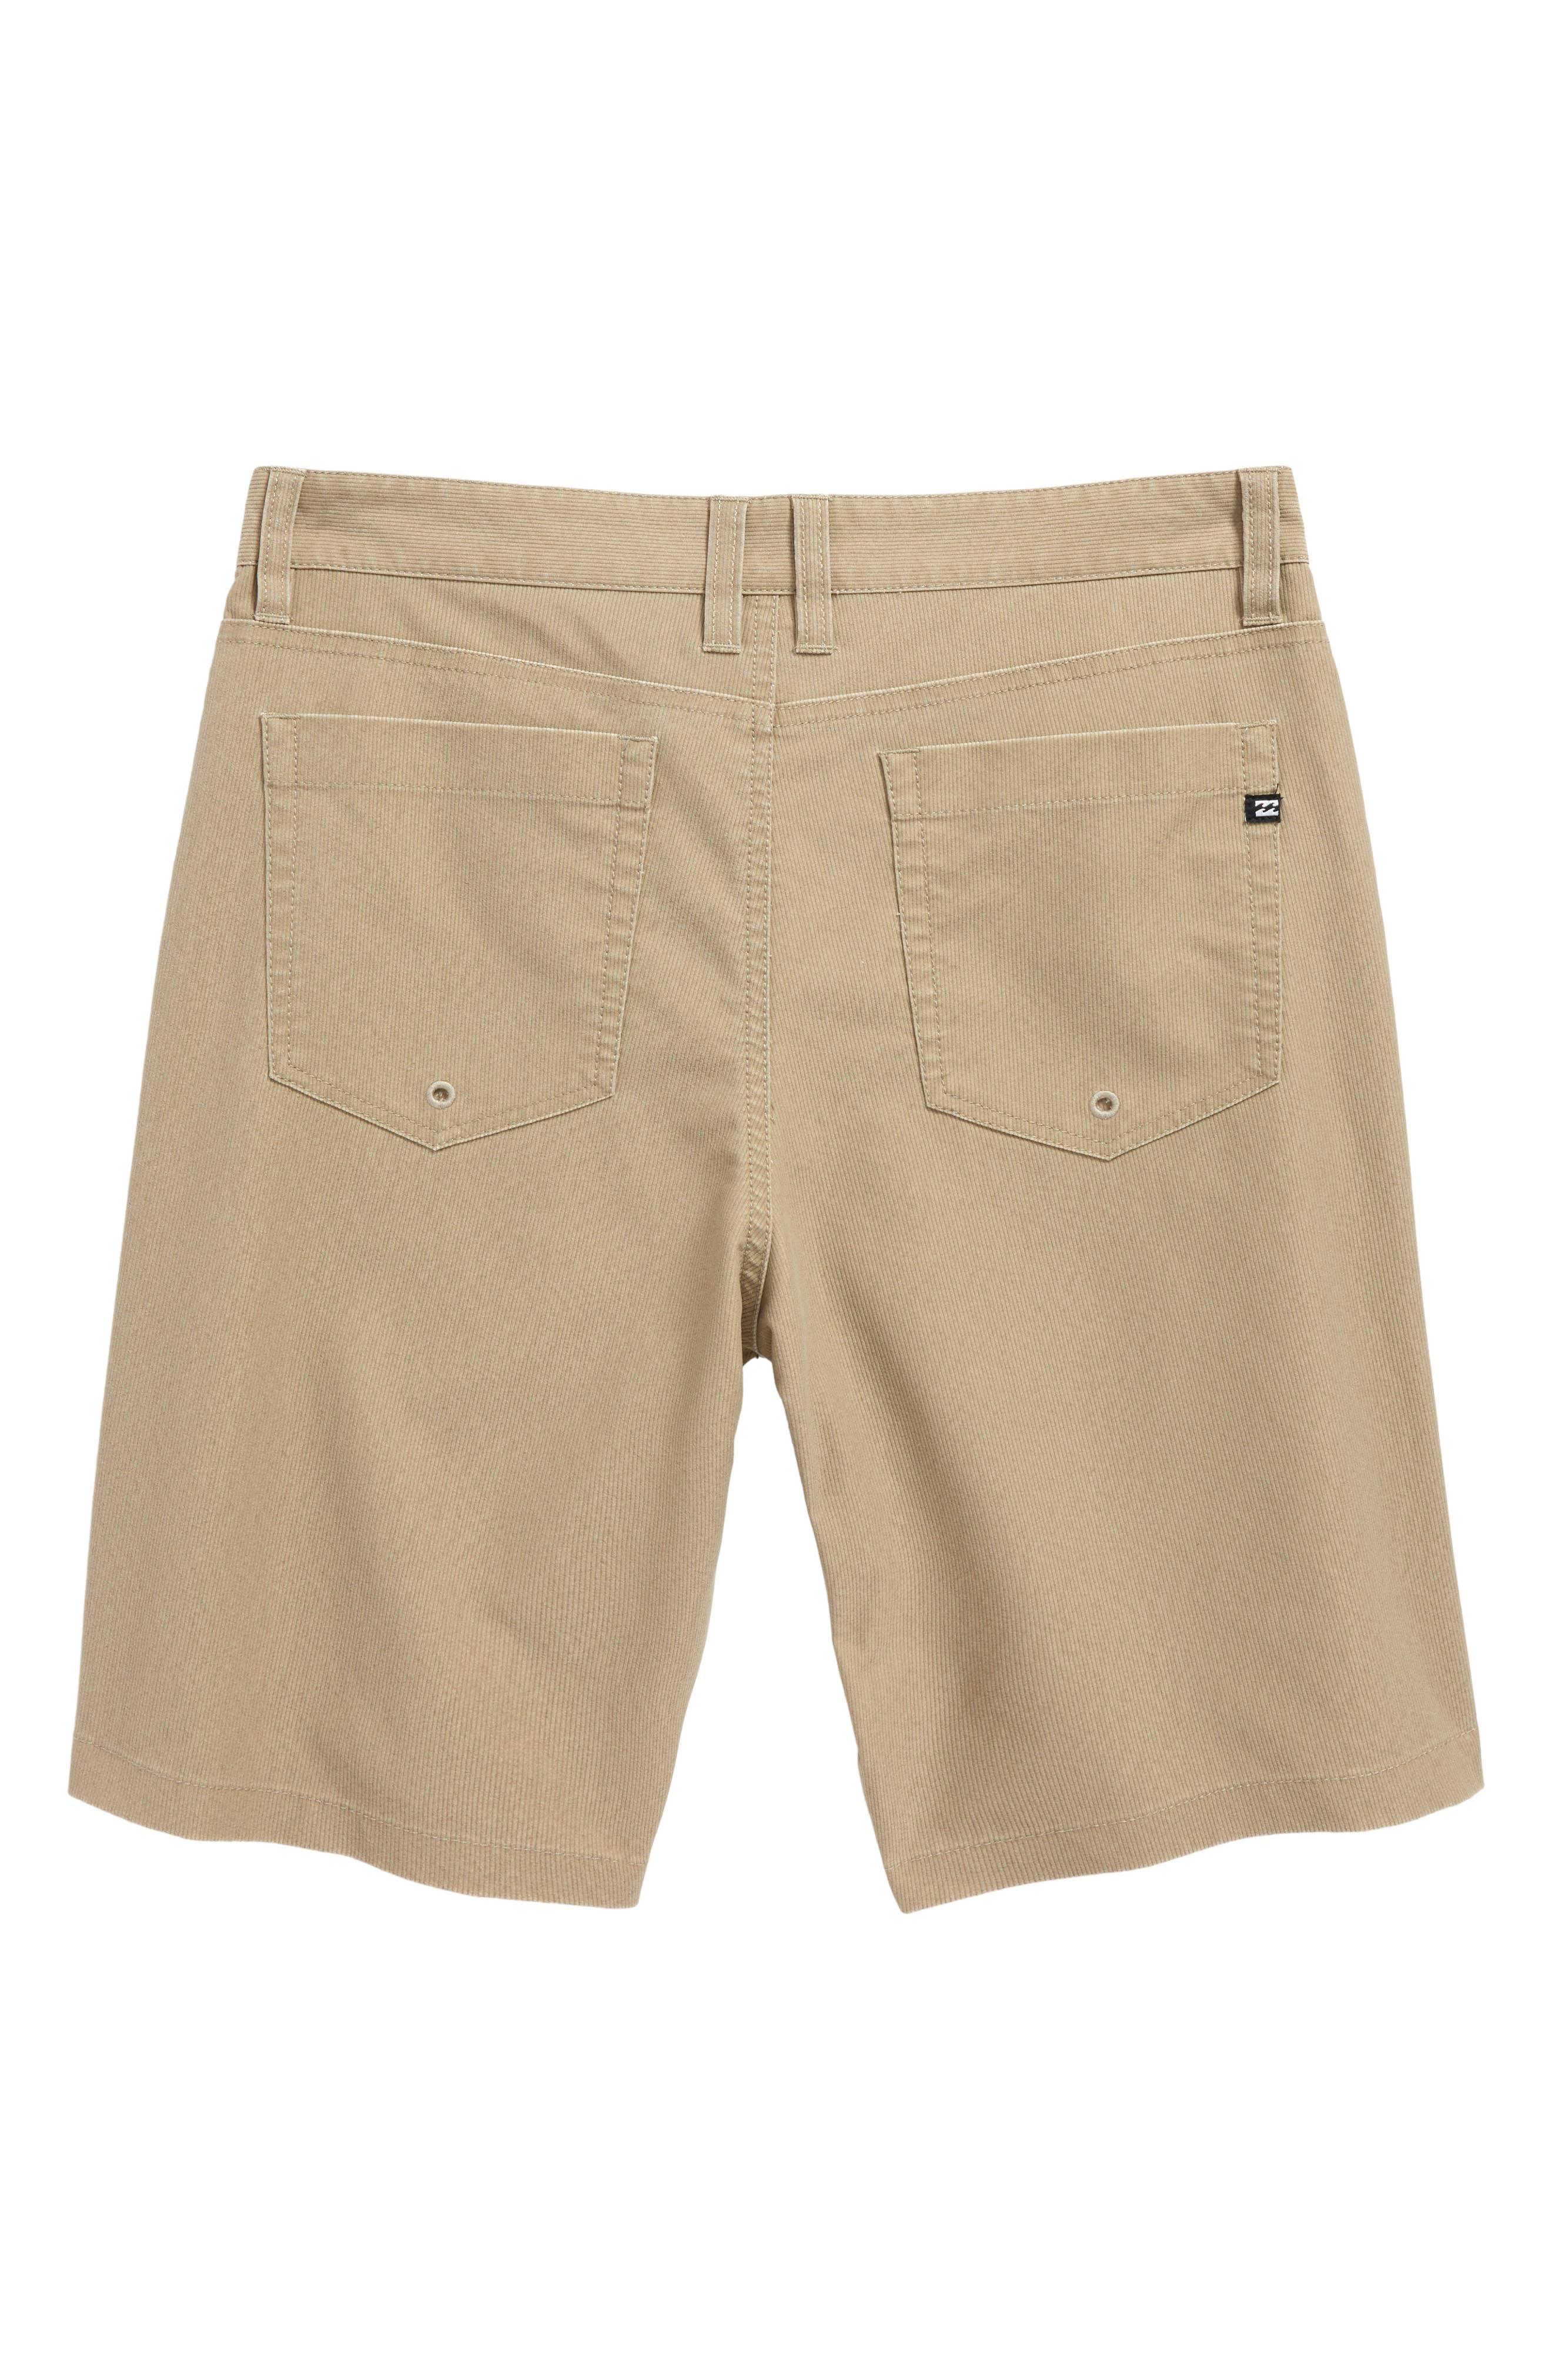 BILLABONG,                             Outsider X Surf Corduroy Hybrid Shorts,                             Alternate thumbnail 2, color,                             259